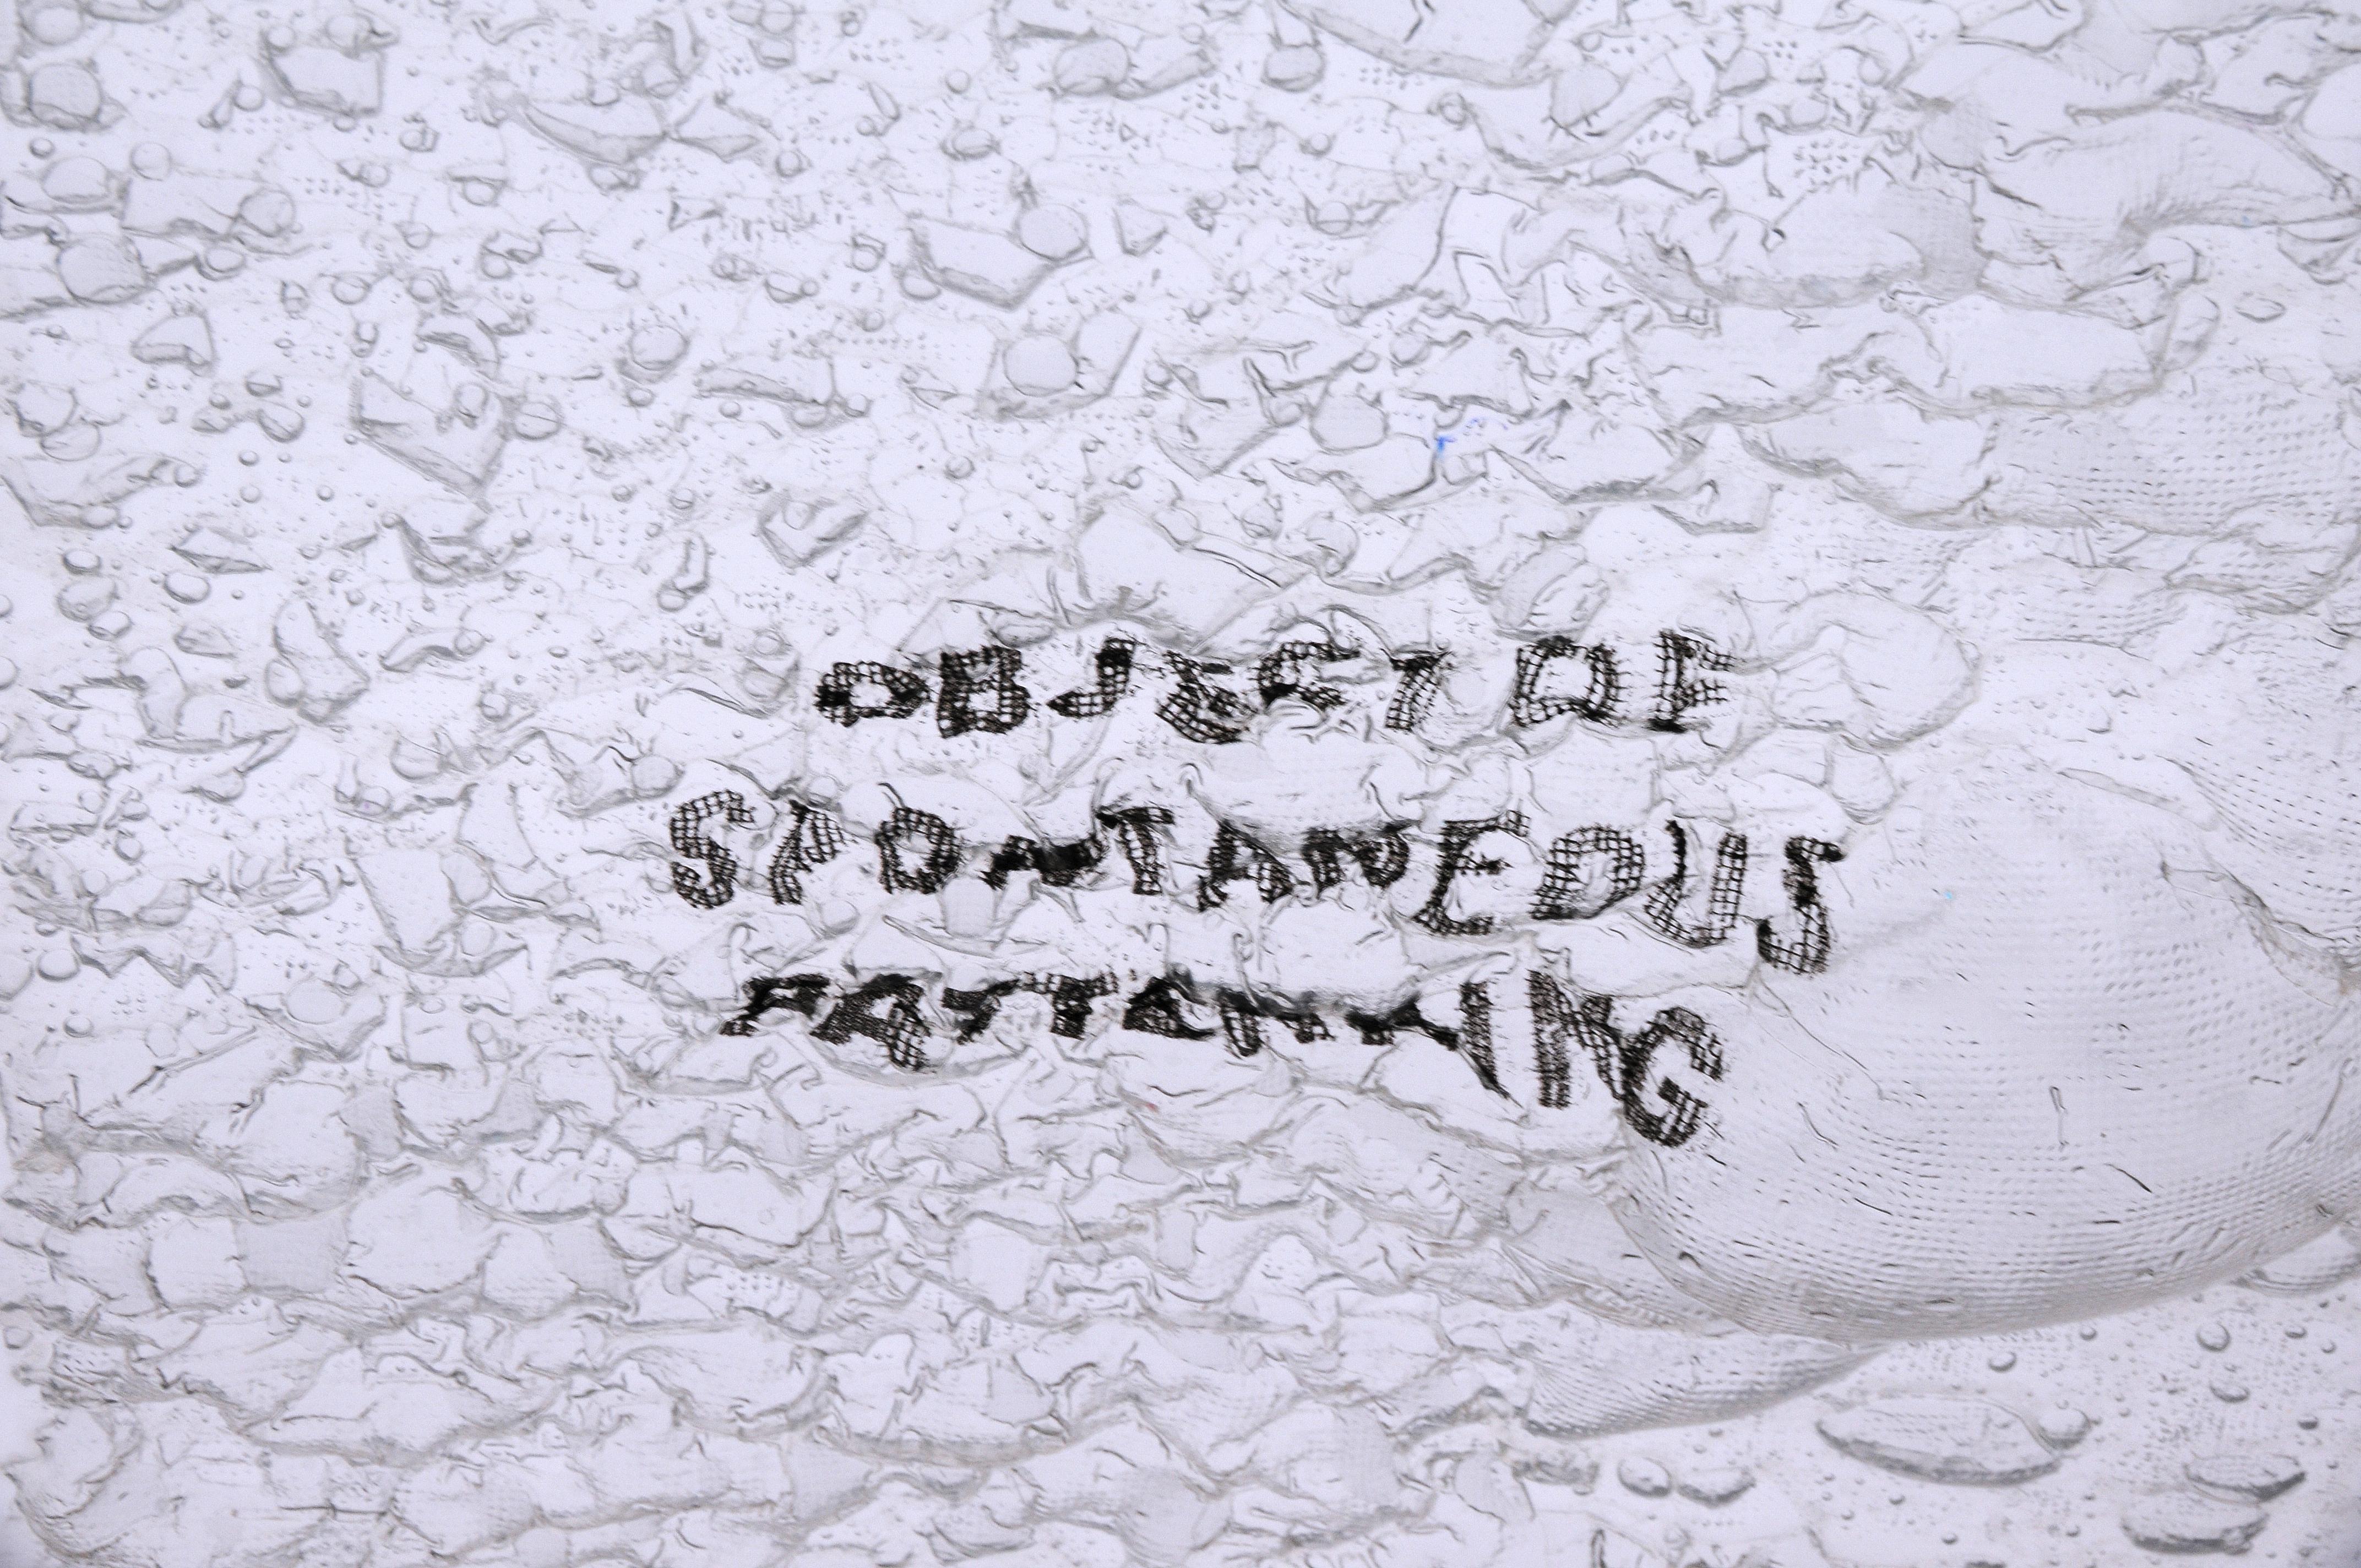 gk-Object_of_Spontaneous_Patterning-03